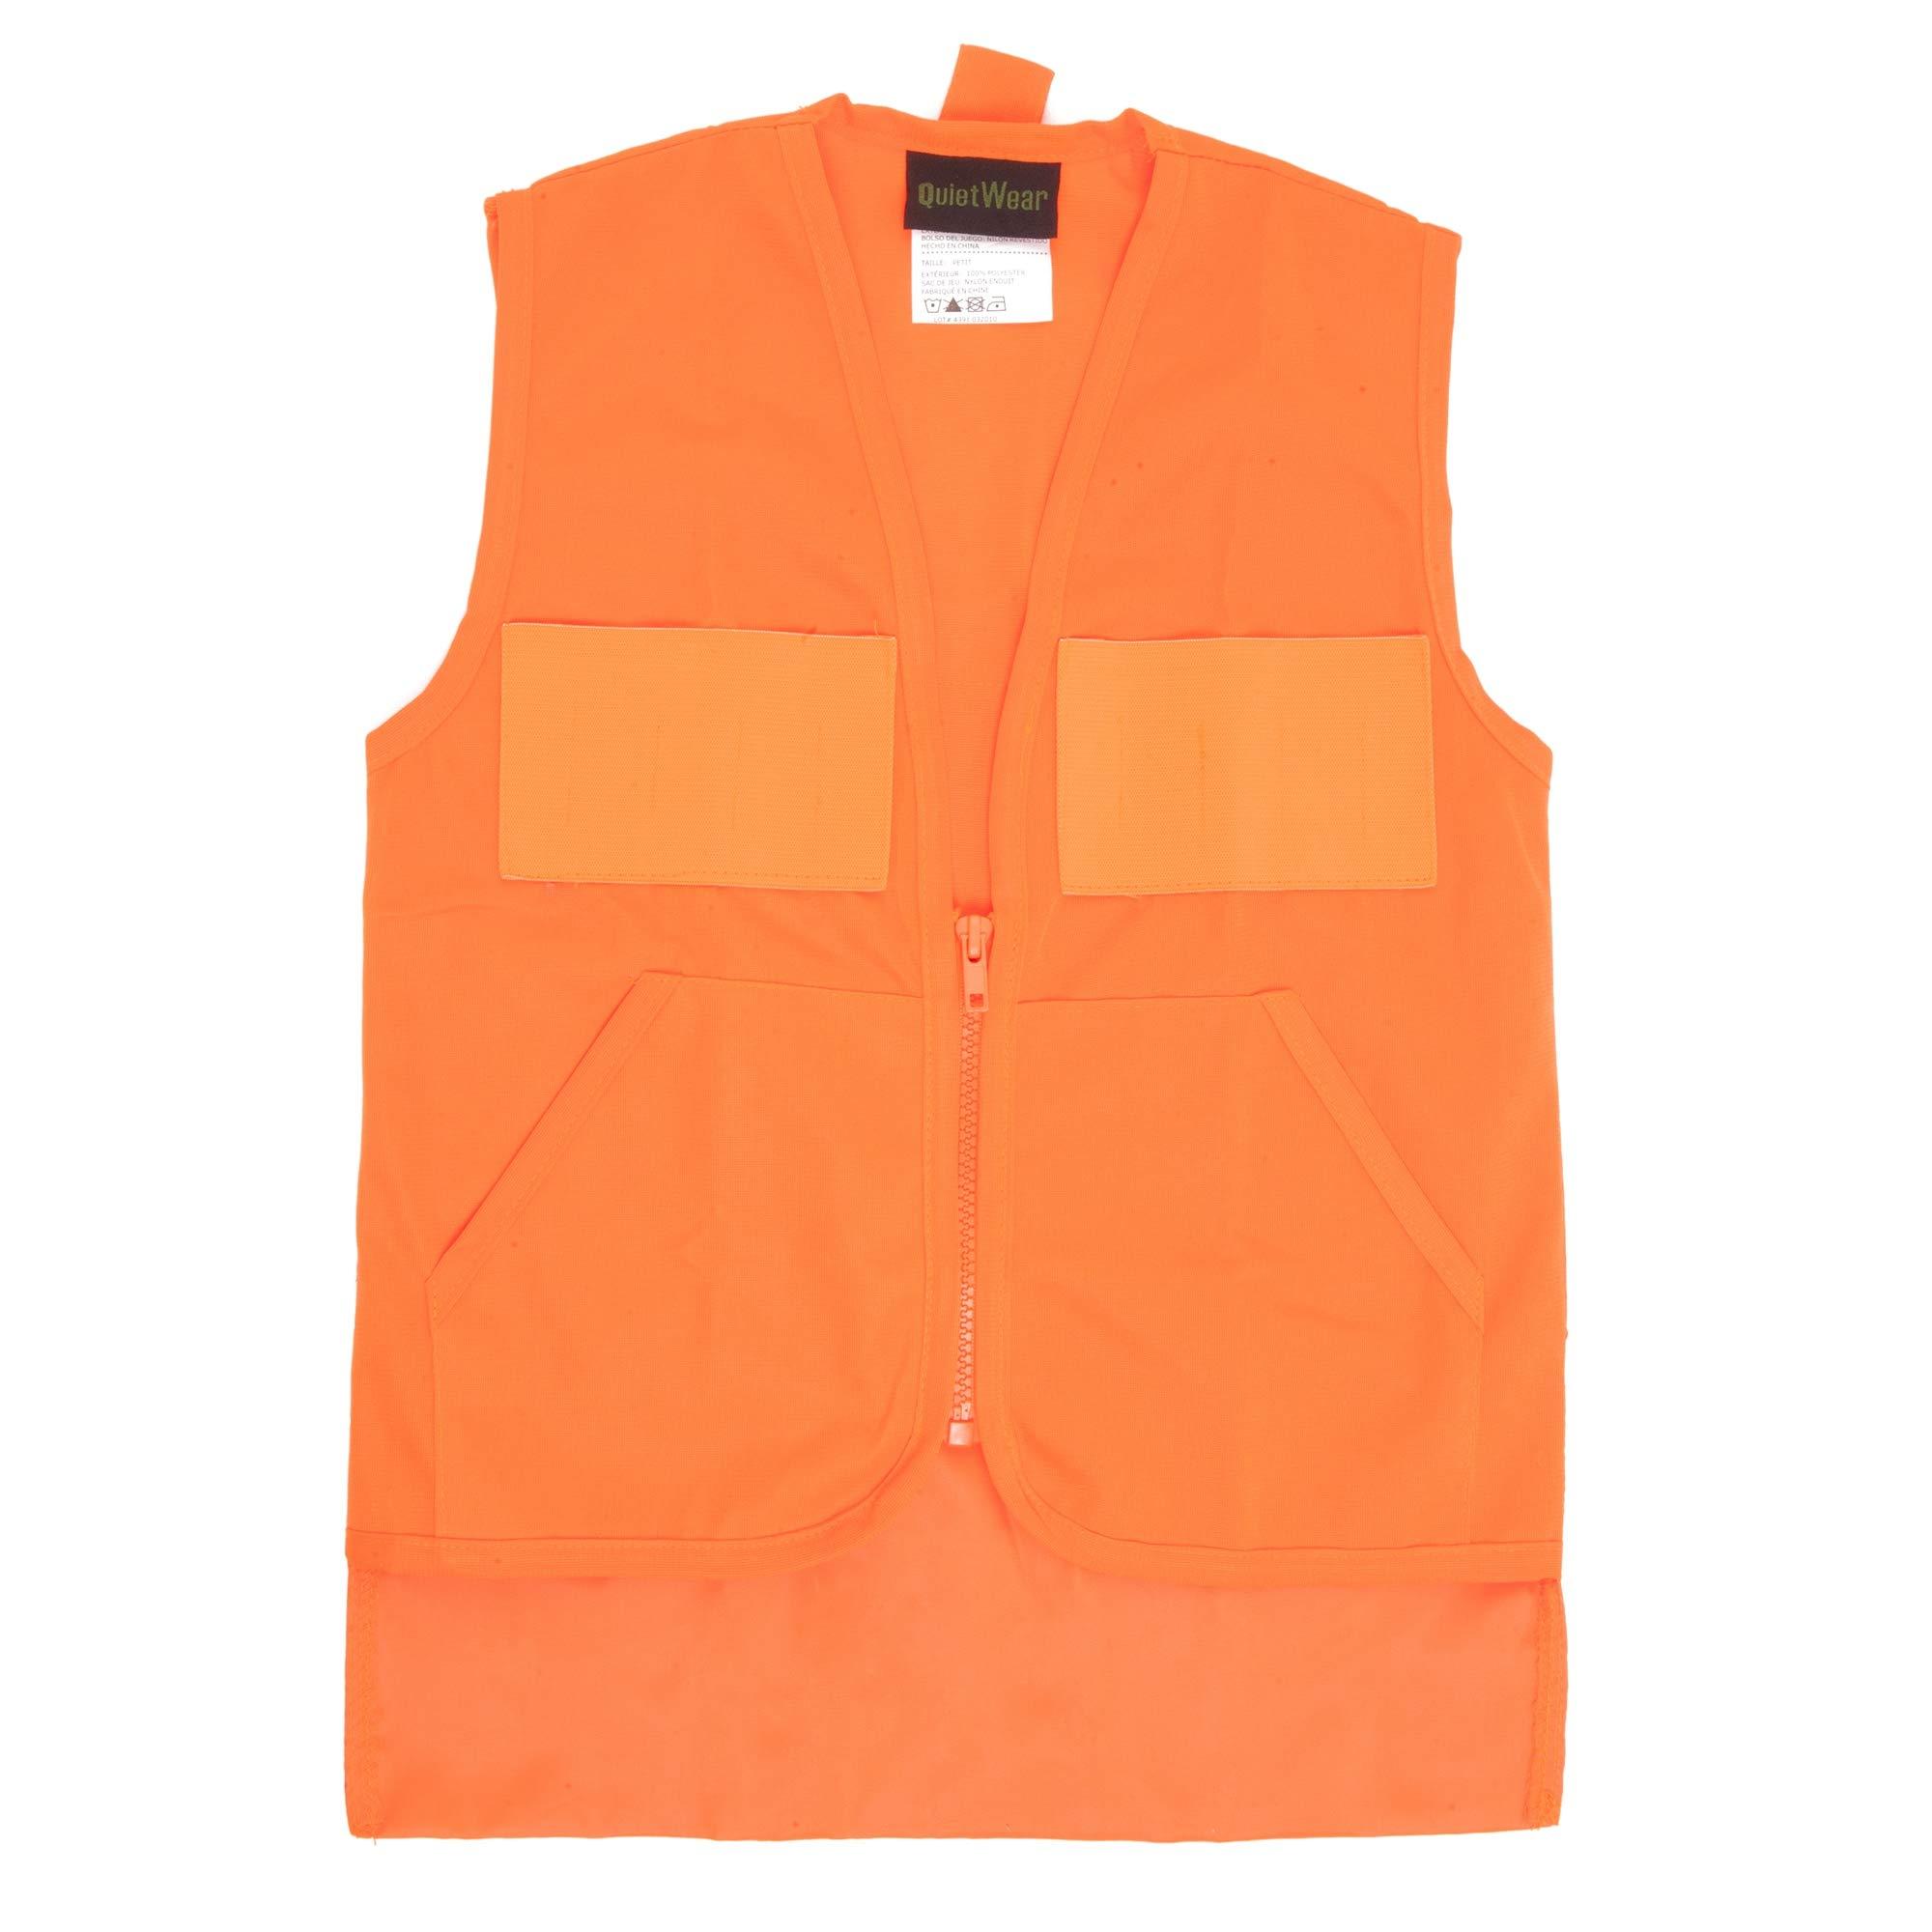 Quietwear Quiet Wear Youth Hunting Vest M by Quietwear